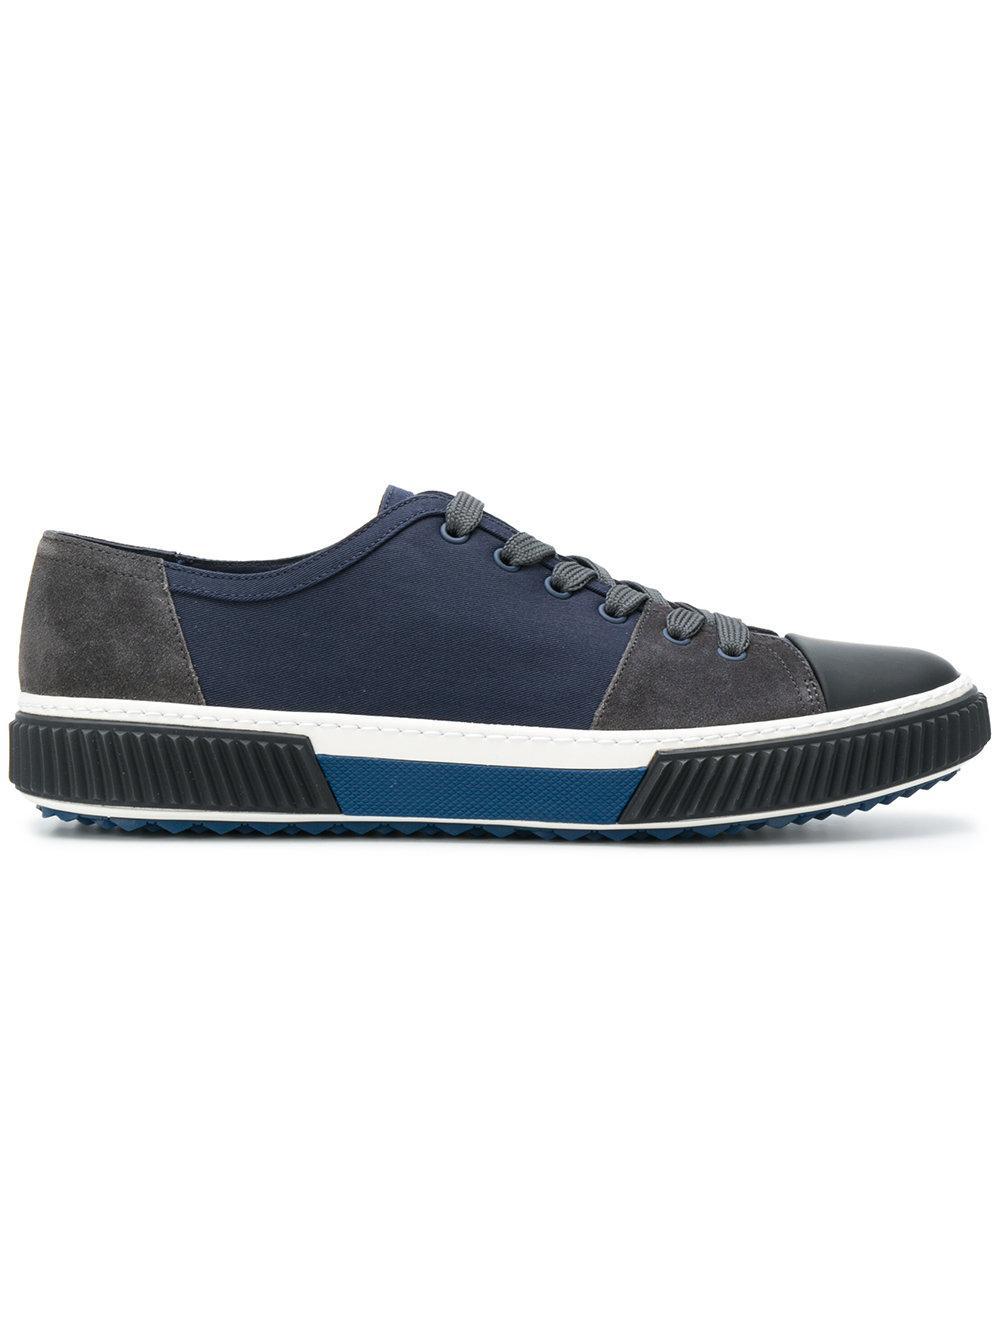 Prada Colour Blocked Sneakers